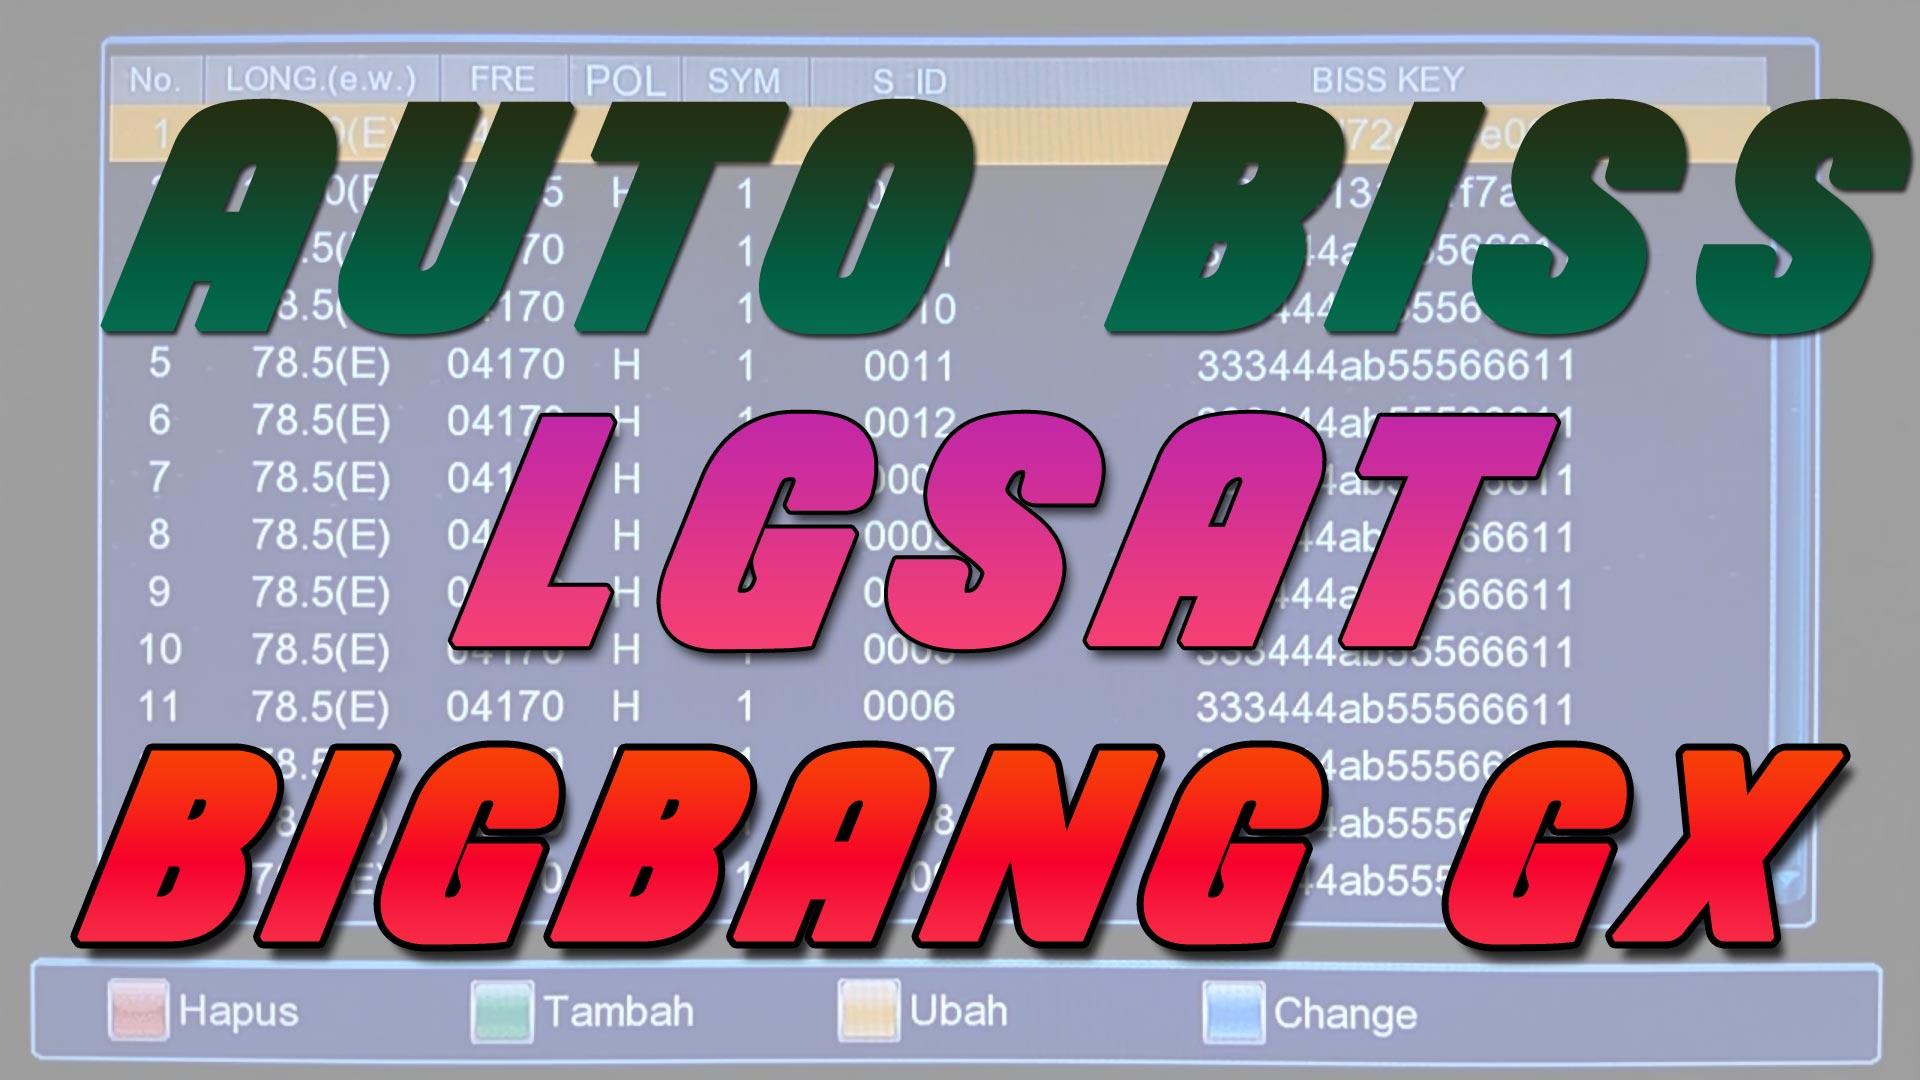 Cara Menggunakan Auto Biss Key di Lgsat Bigbang Guoxin GX6605S